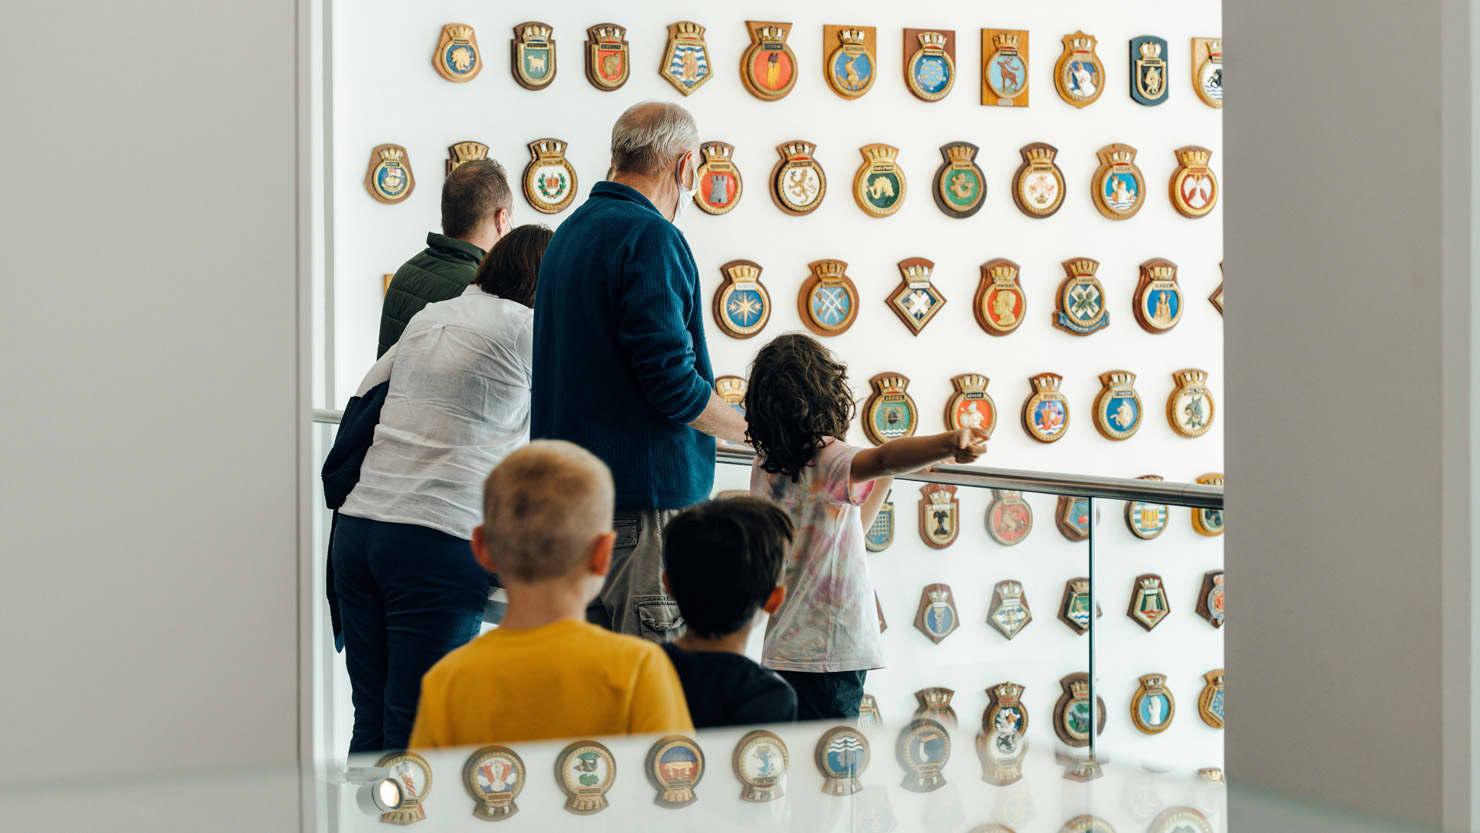 A family looking at the ship's badges at The Box, Plymouth